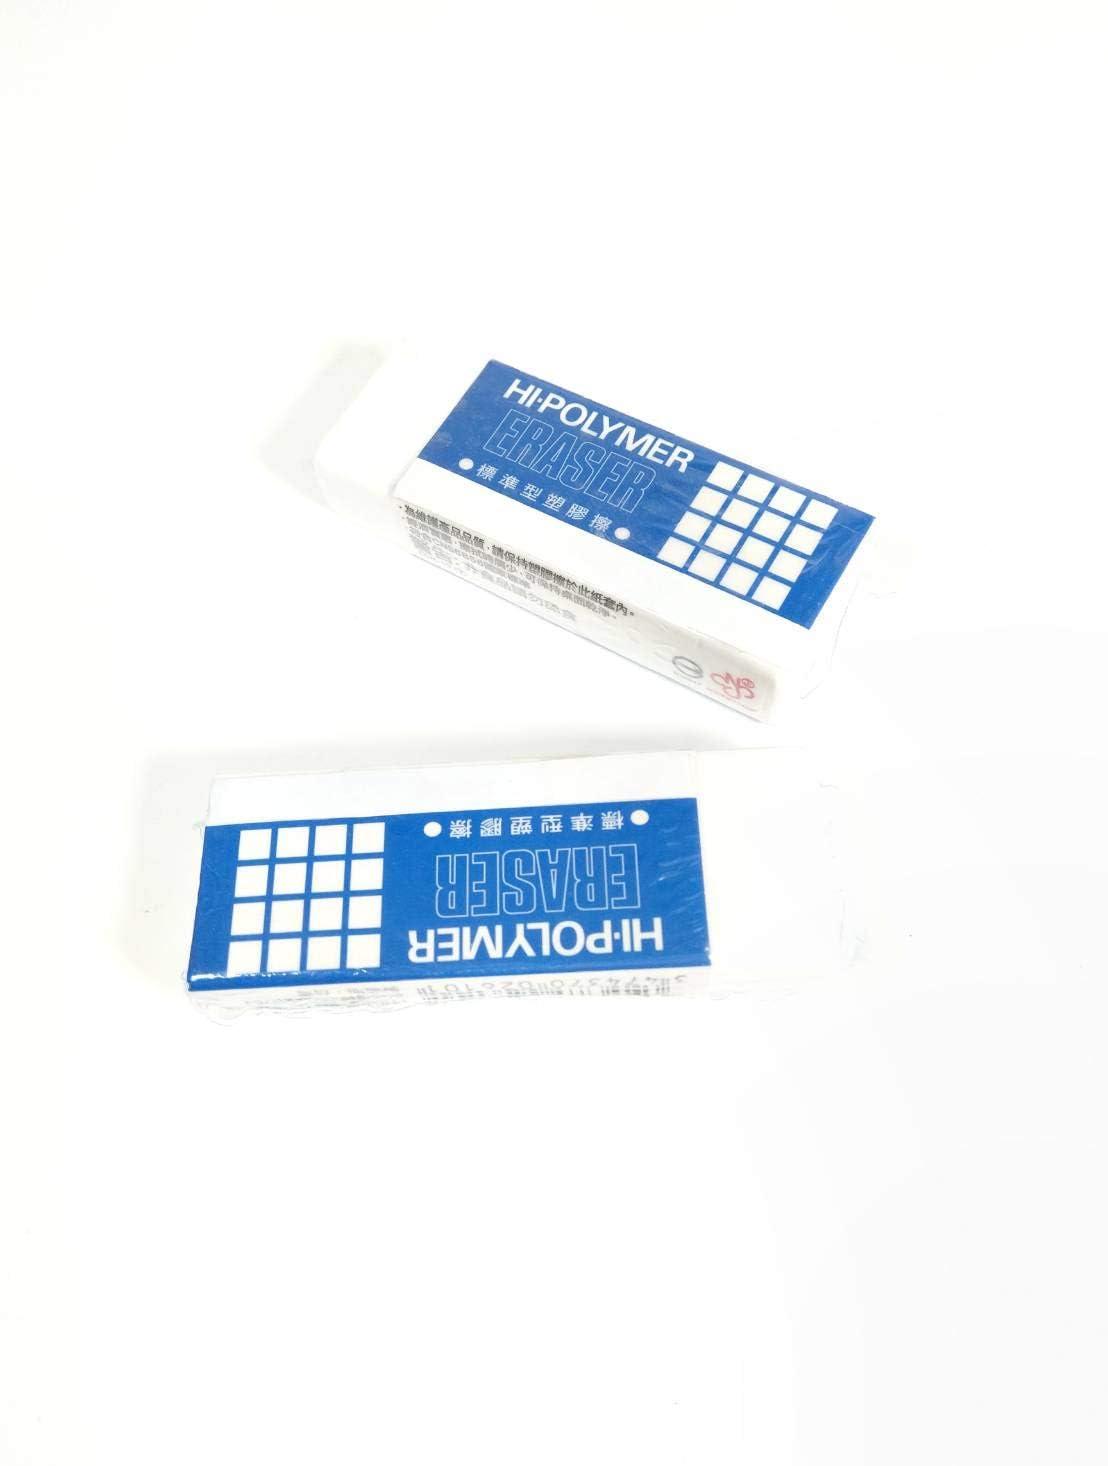 Hi-Polymer Eraser Nonabrasive Translated Large White 2 pcs of Set Ranking TOP15